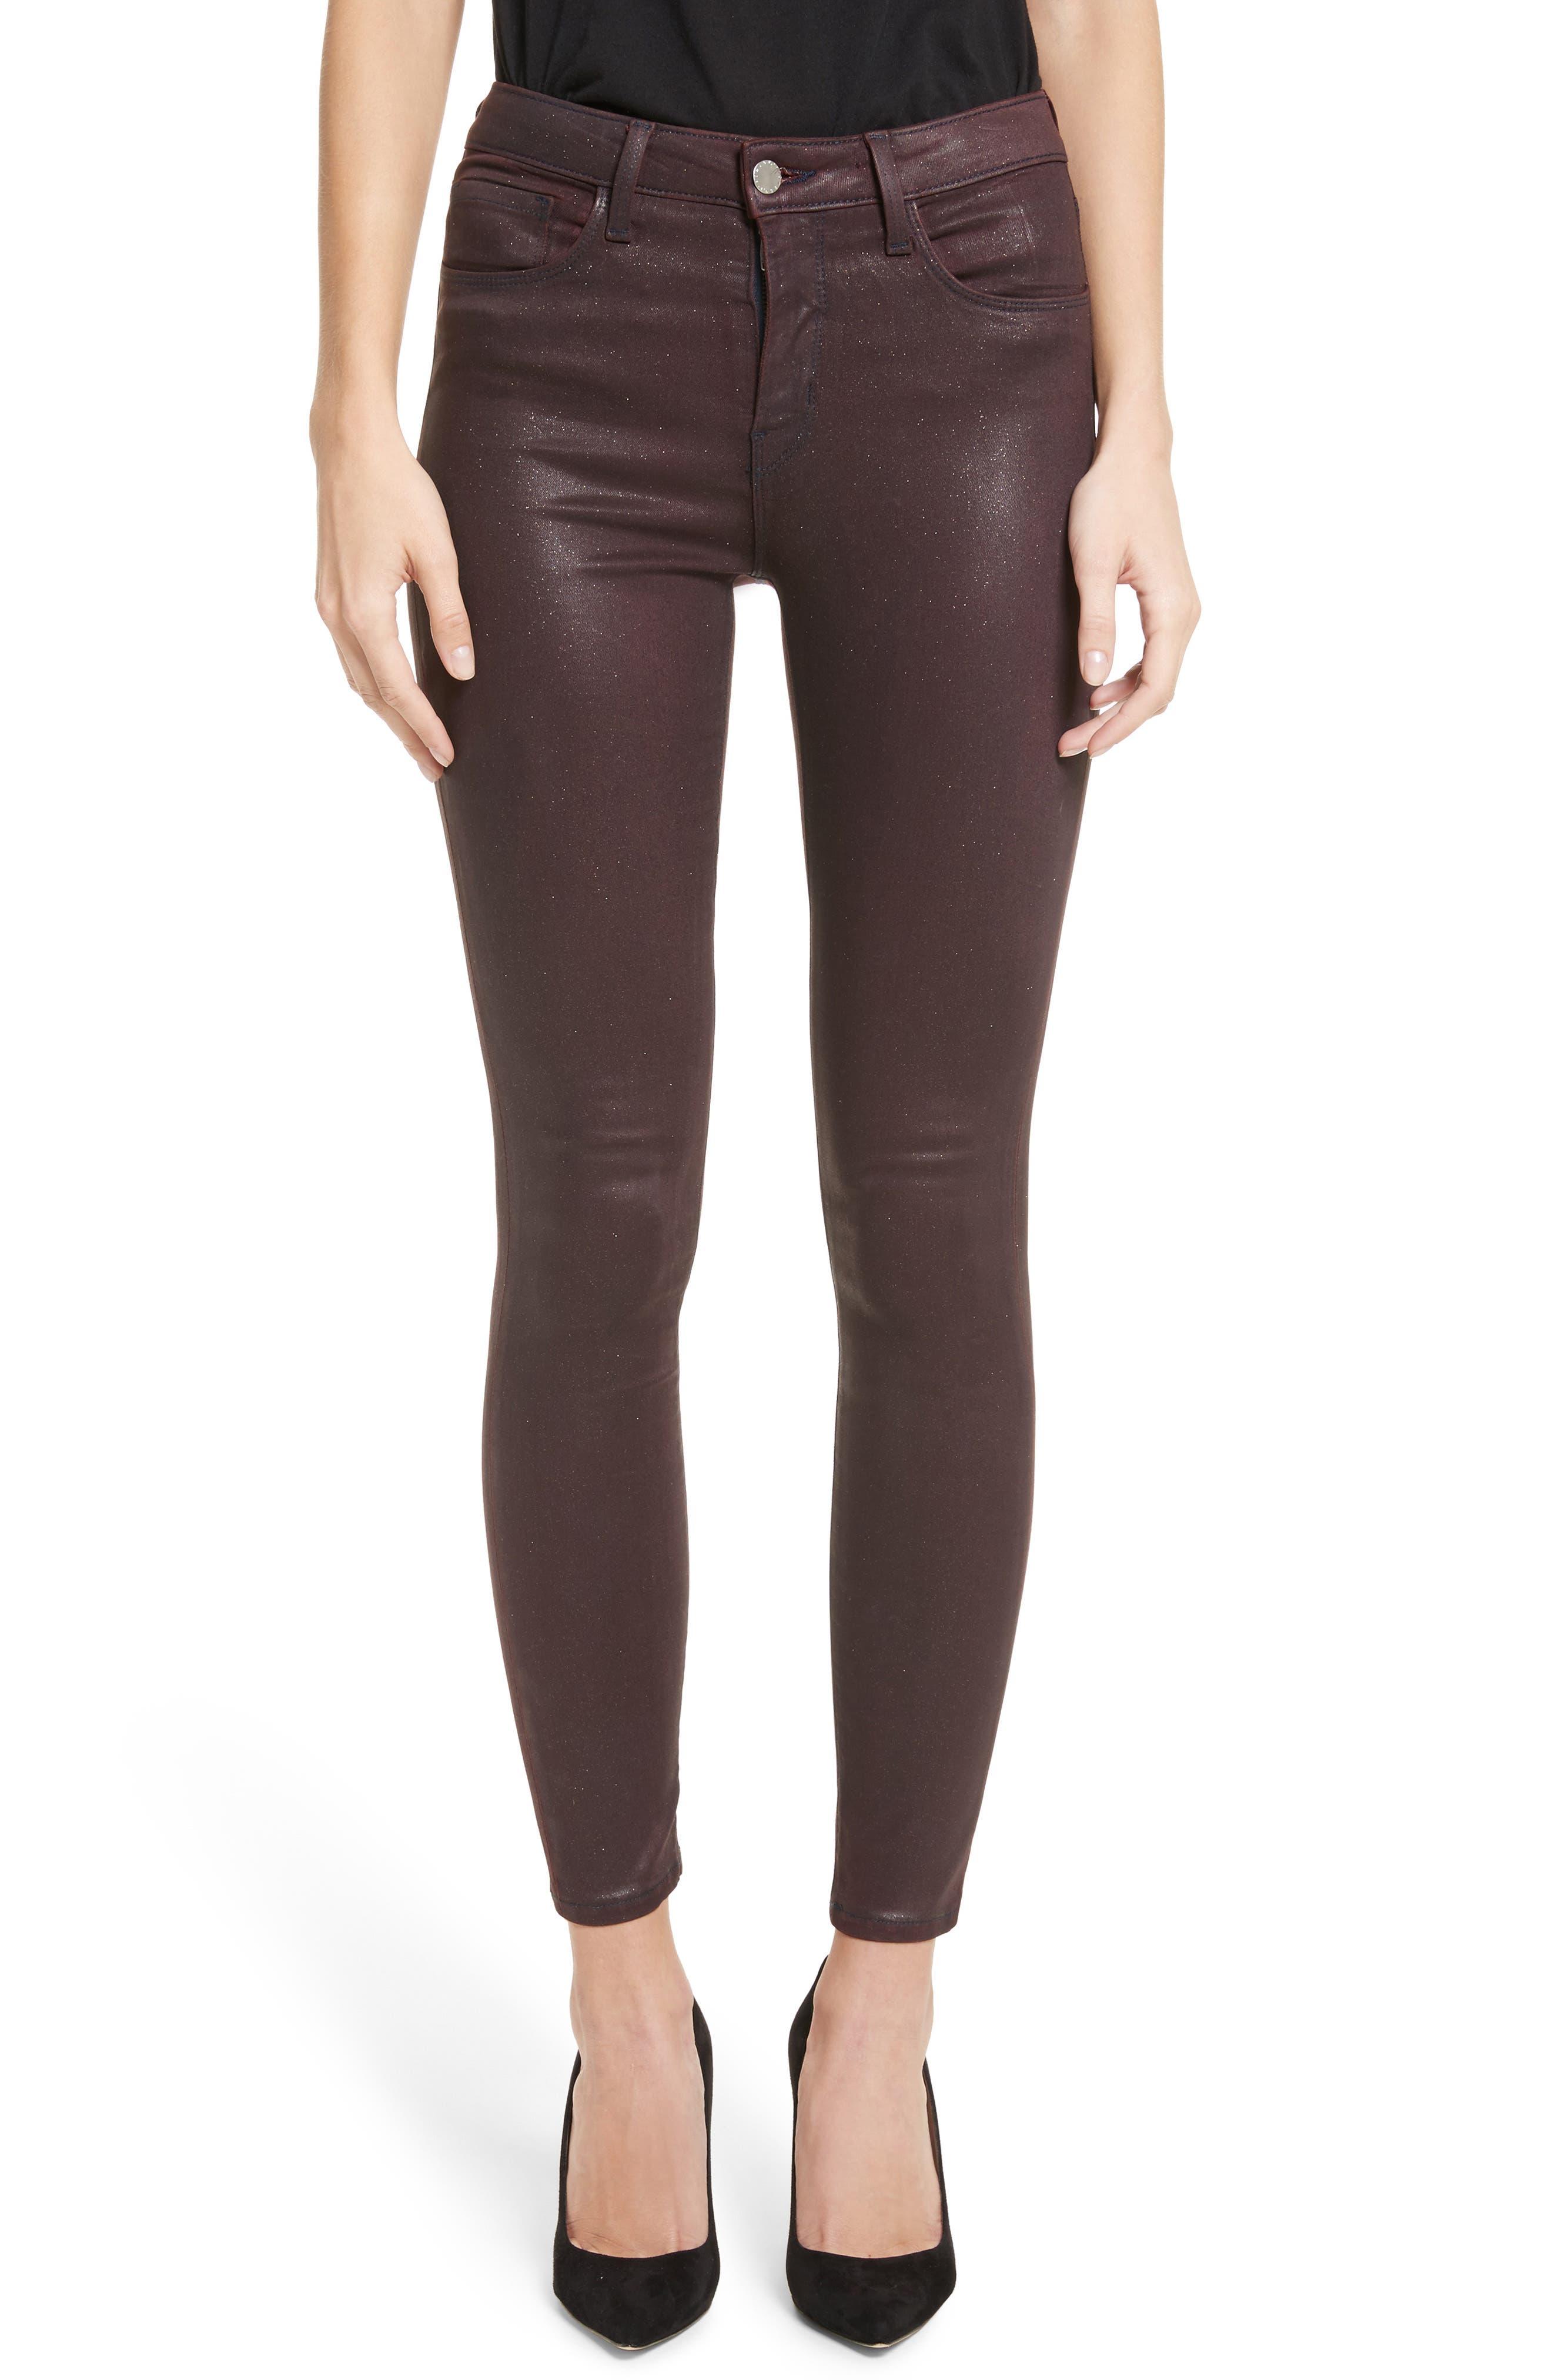 Margot High Waist Glitter Coated Jeans,                         Main,                         color, Bordeaux Glitter Coated